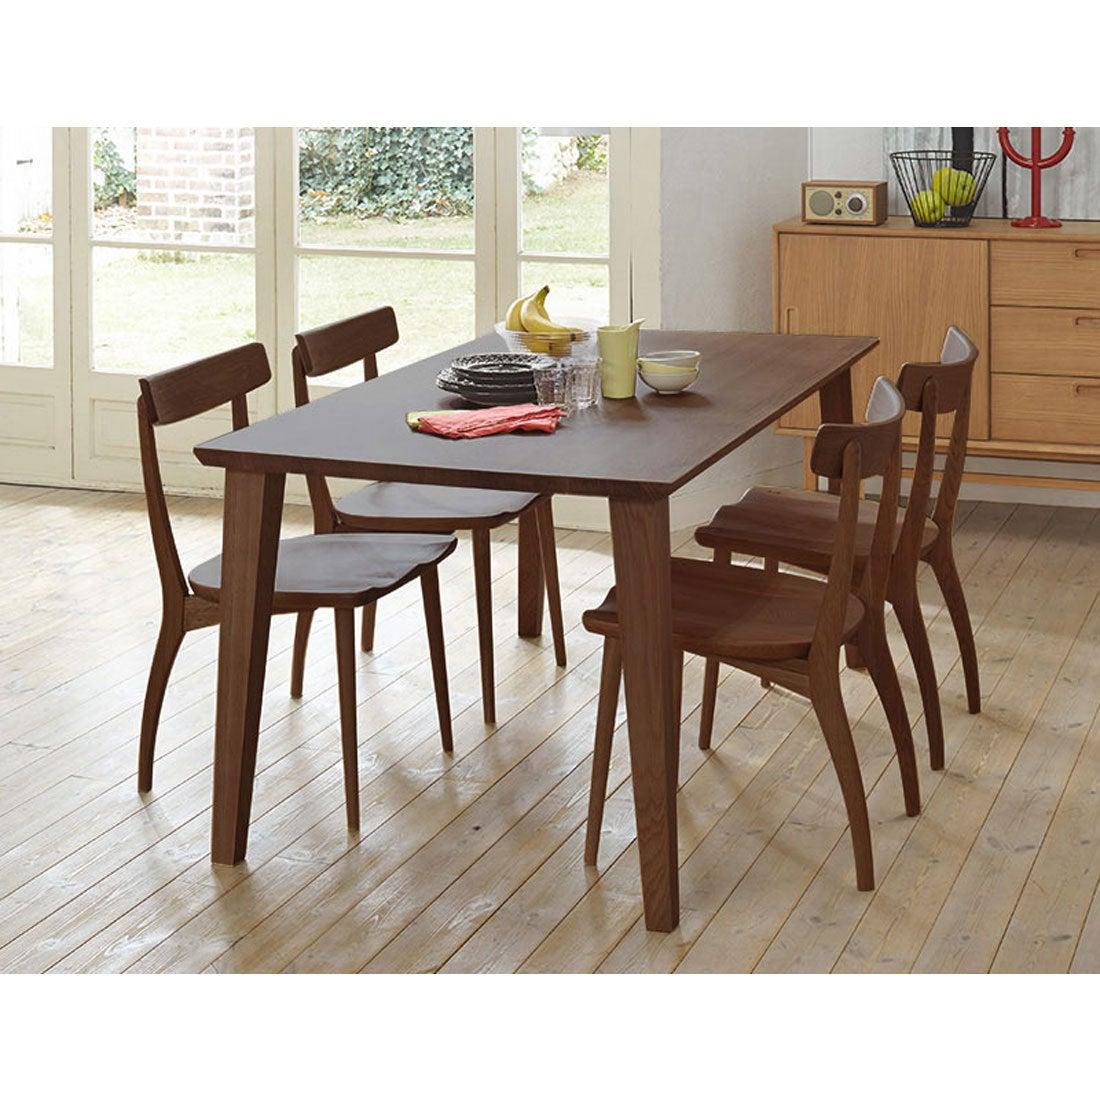 IDC OTSUKA/大塚家具 ダイニングテーブル フィル3 角丸天板/木製脚 W1350/ウォールナット材WN2色(ウォールナット)